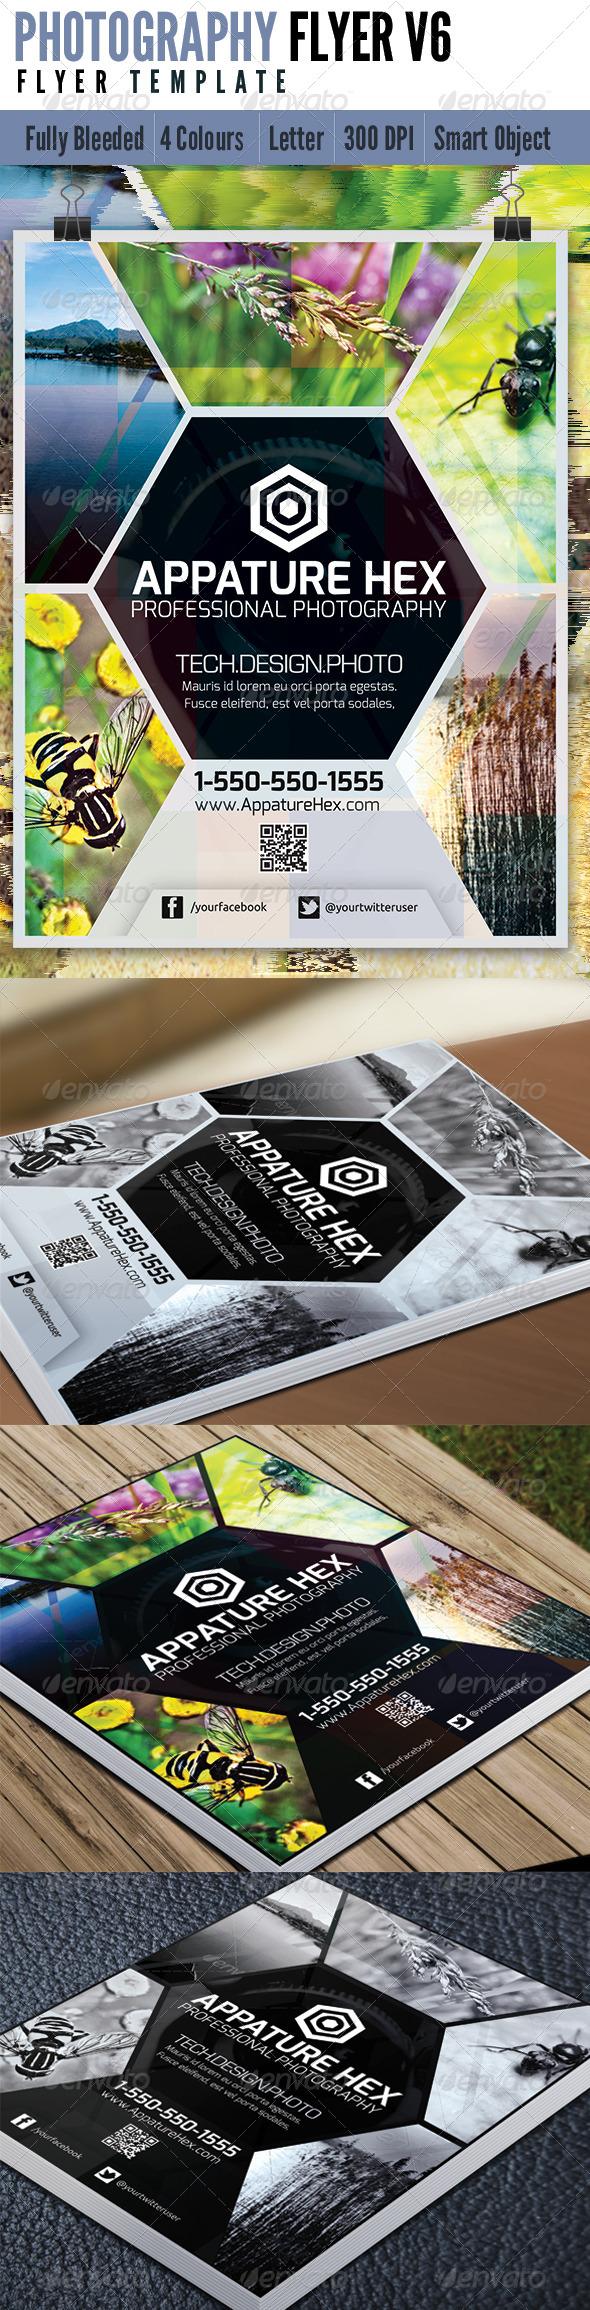 Photography Flyer V6